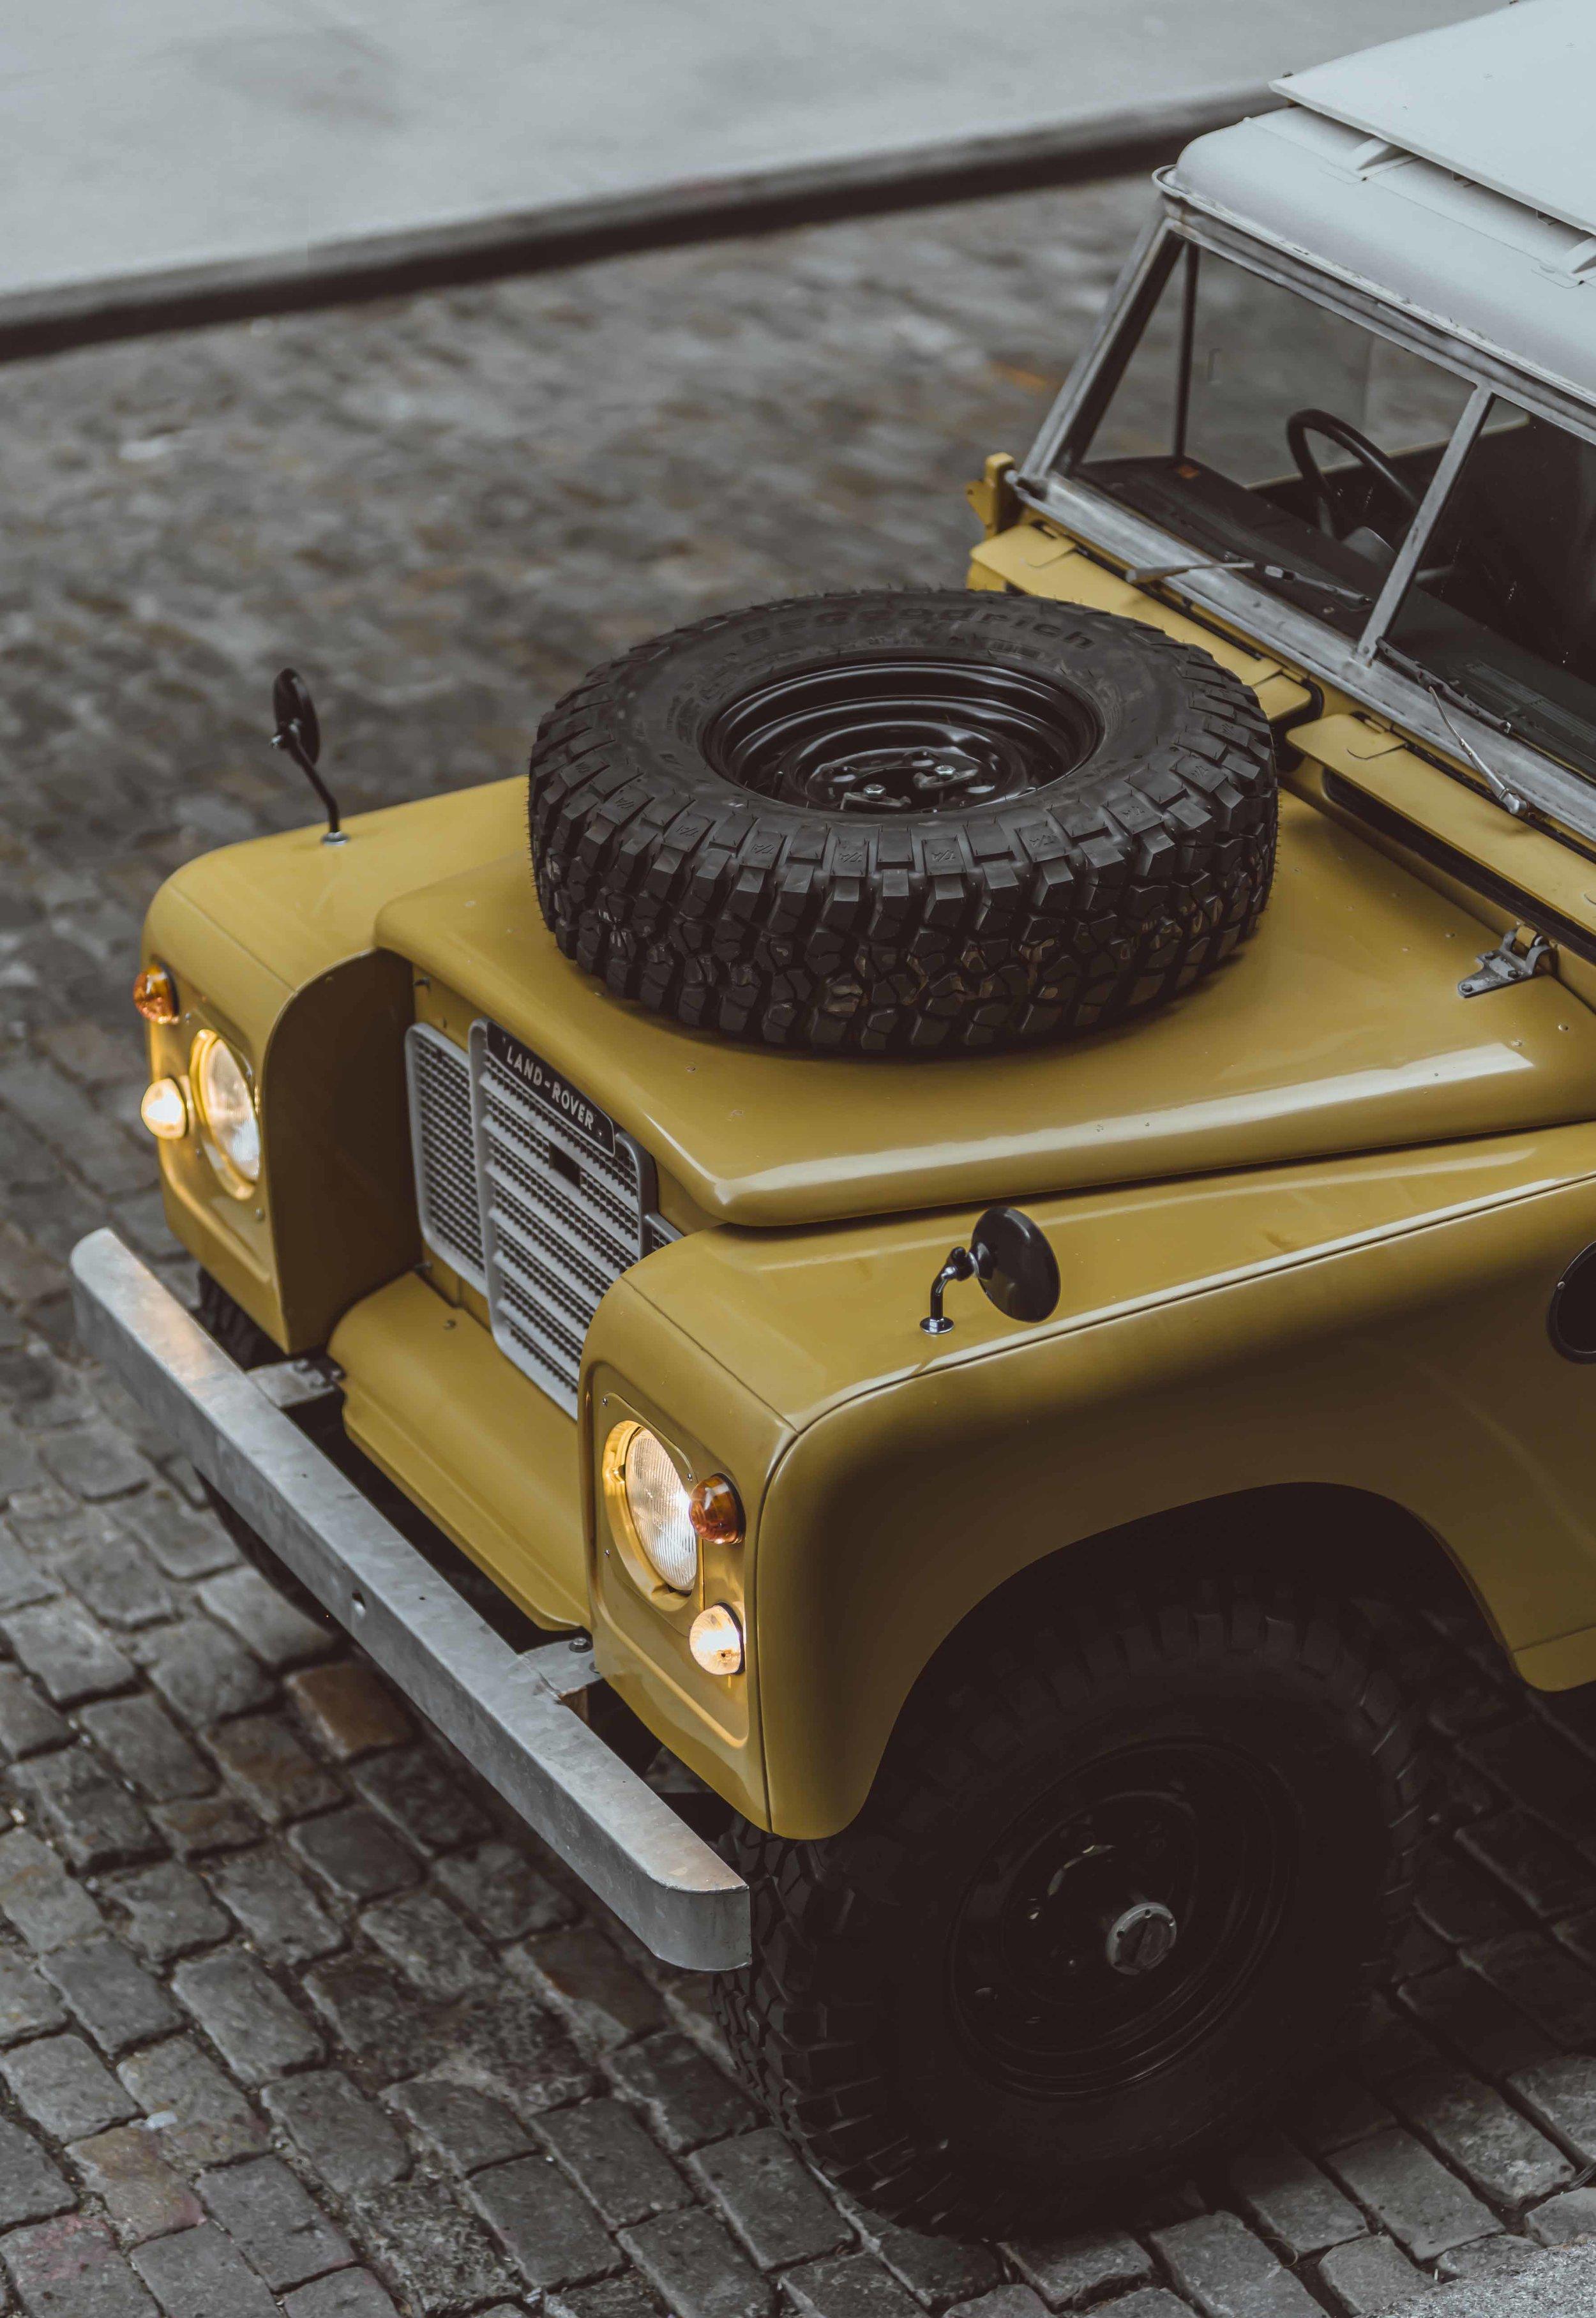 1975_Land_Rover_Series_III_109_Bahama_Gold_2XLarge_0002_Layer 21.jpg